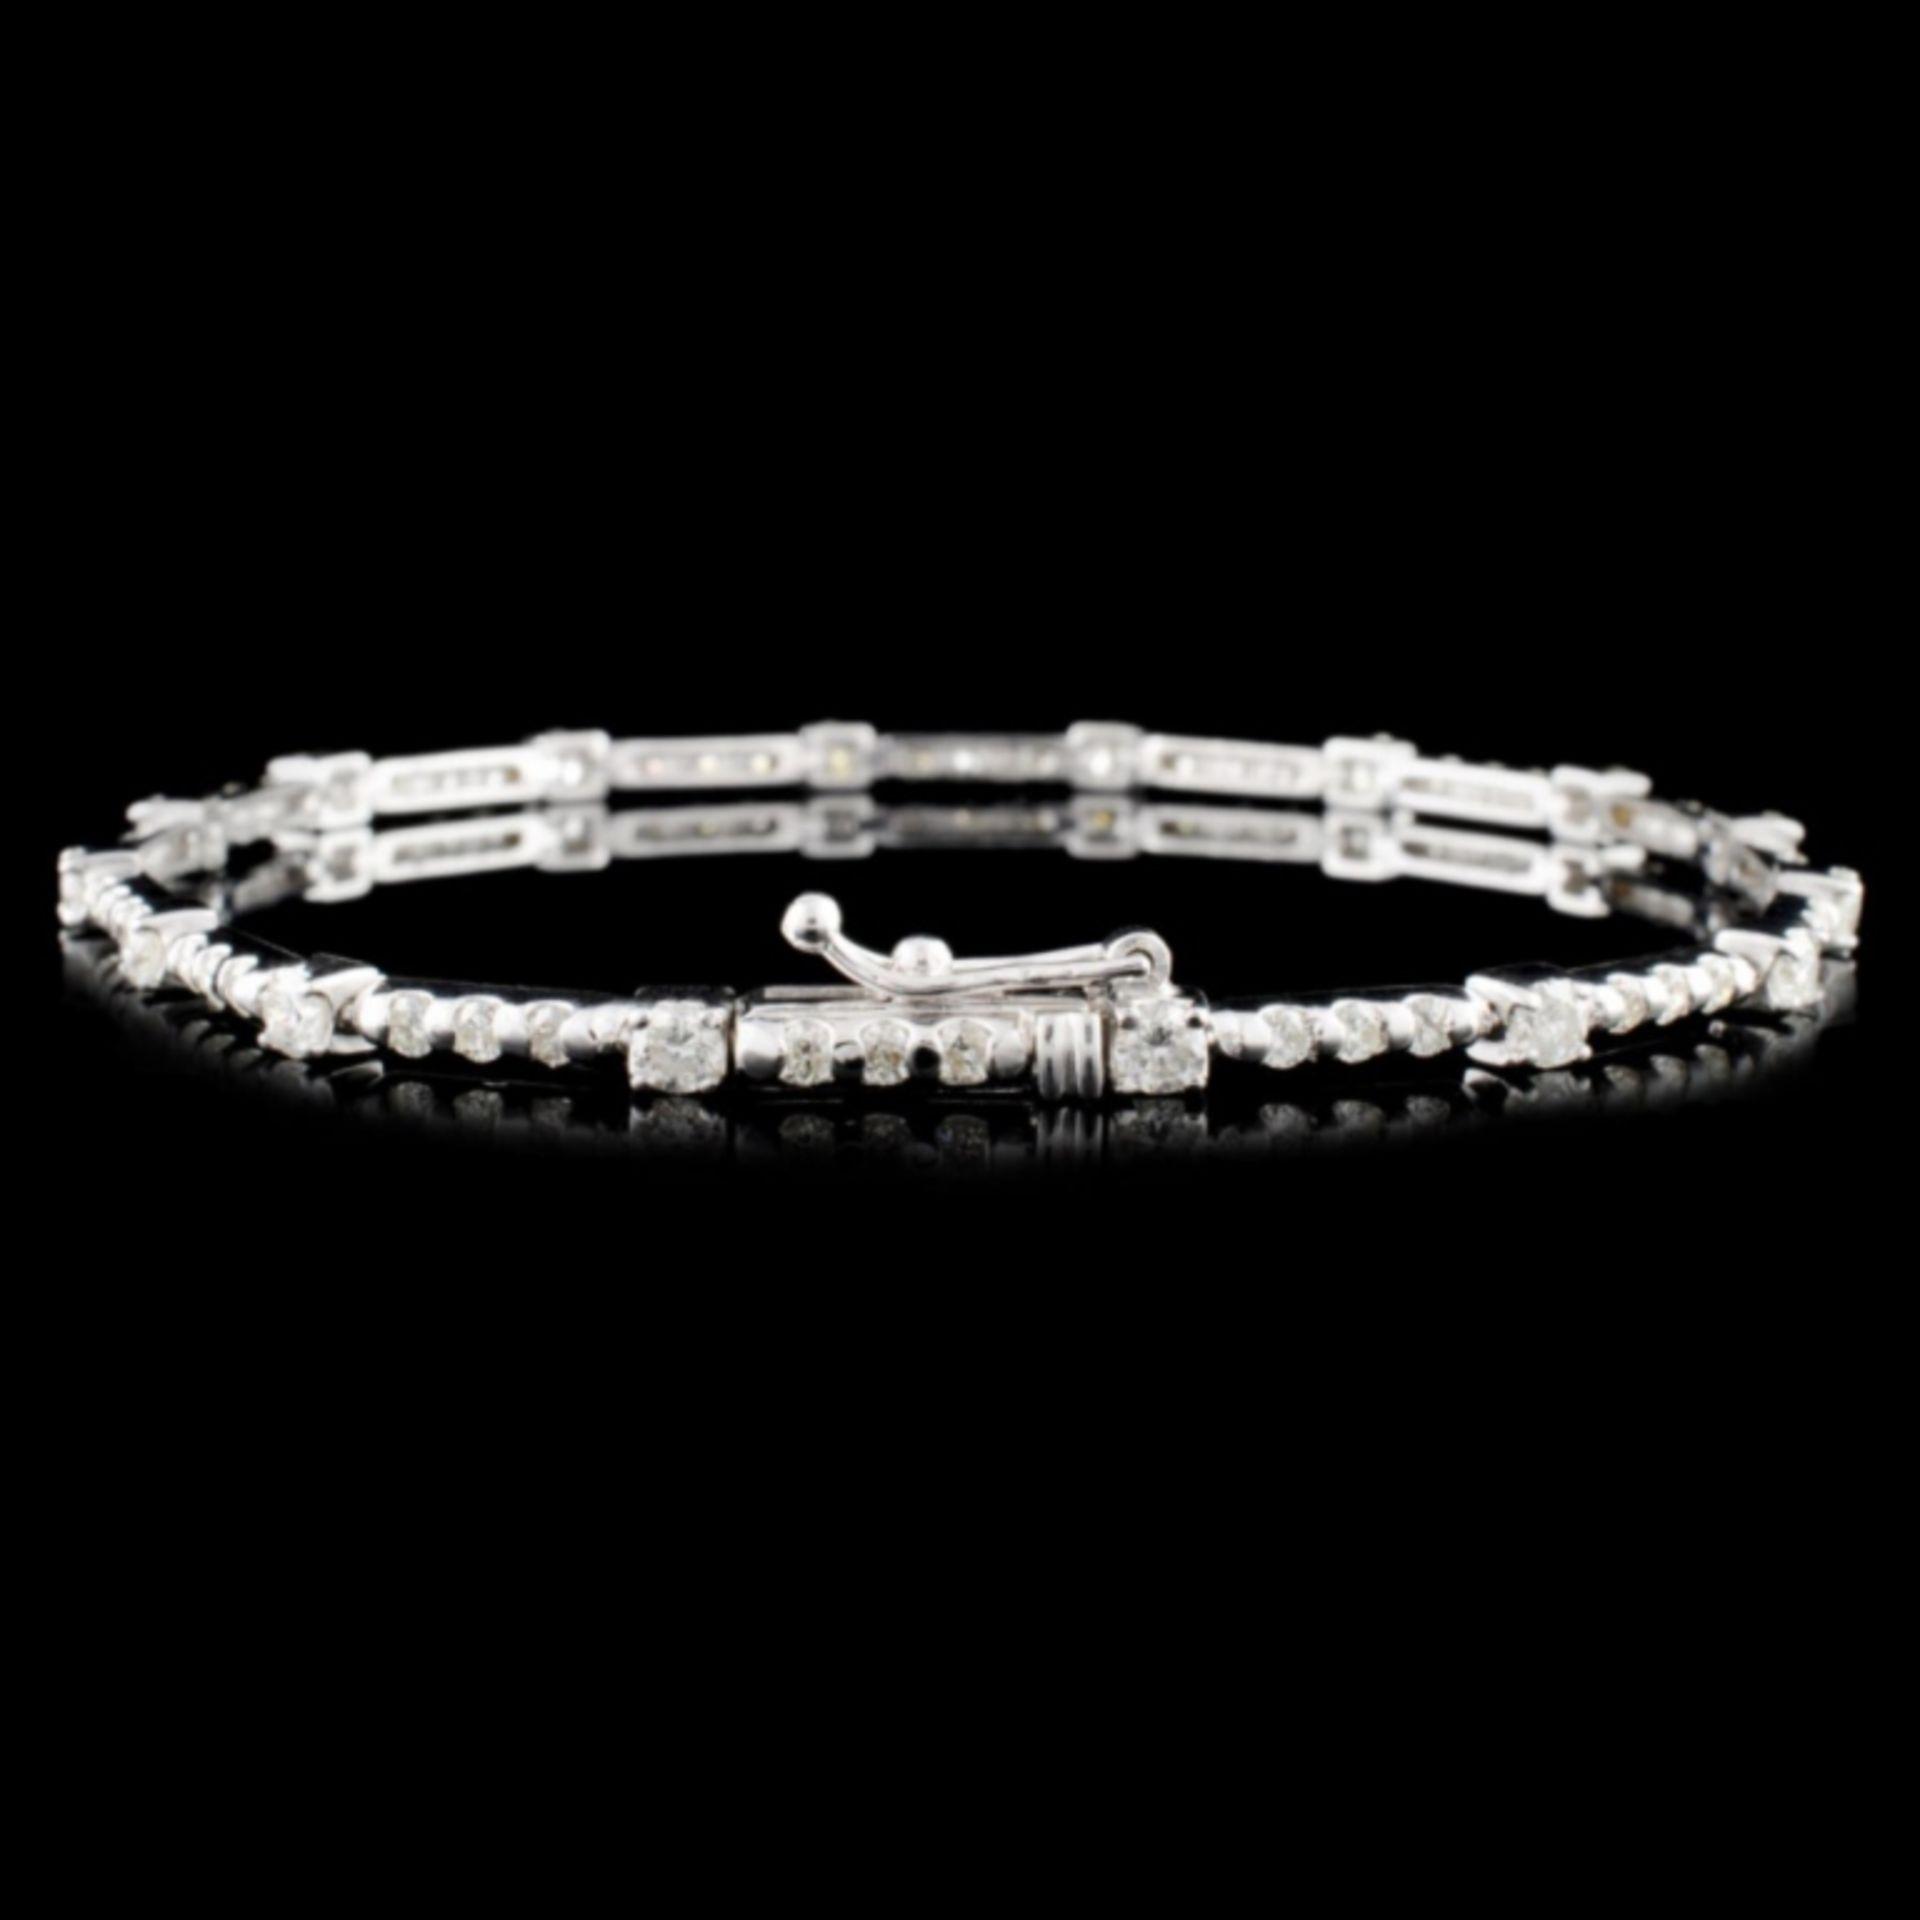 18K Gold 2.00ctw Diamond Bracelet - Image 2 of 3